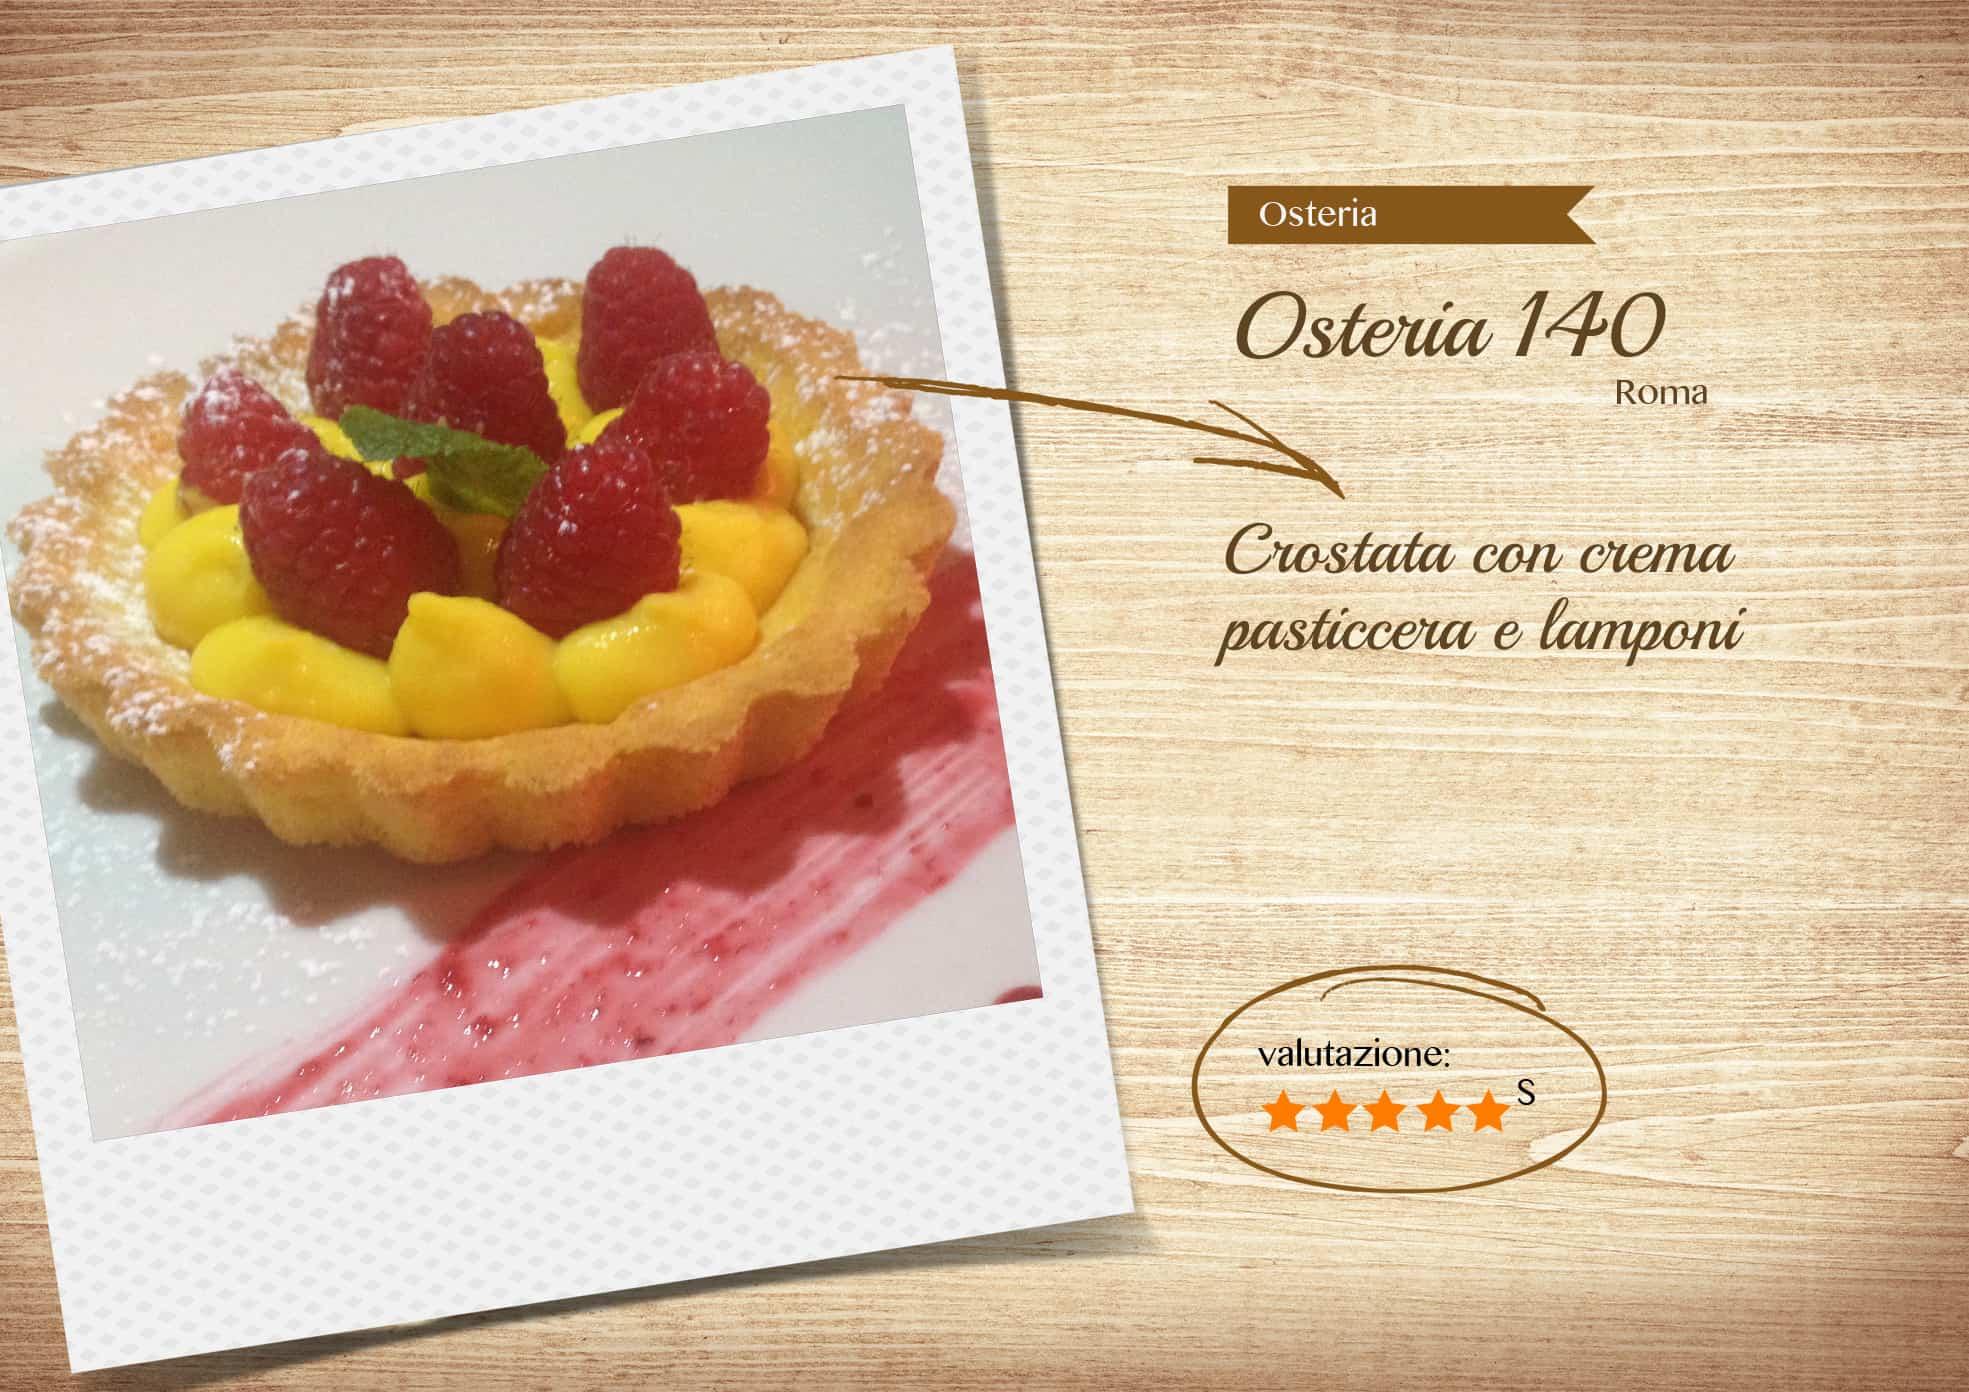 Osteria 140